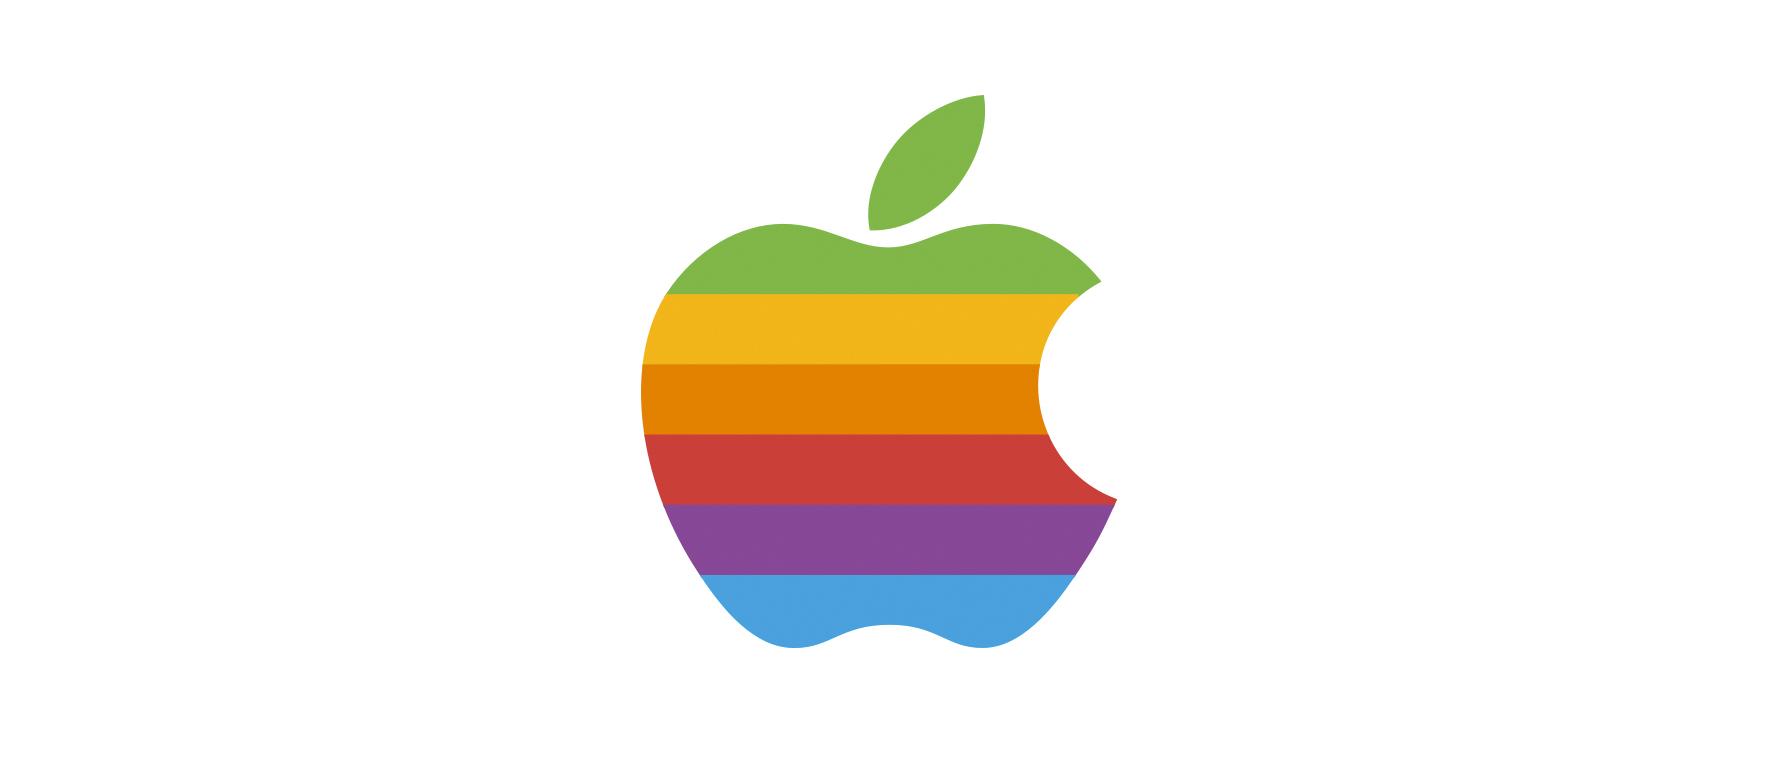 Logotipo de Apple Rob Janoff 1977